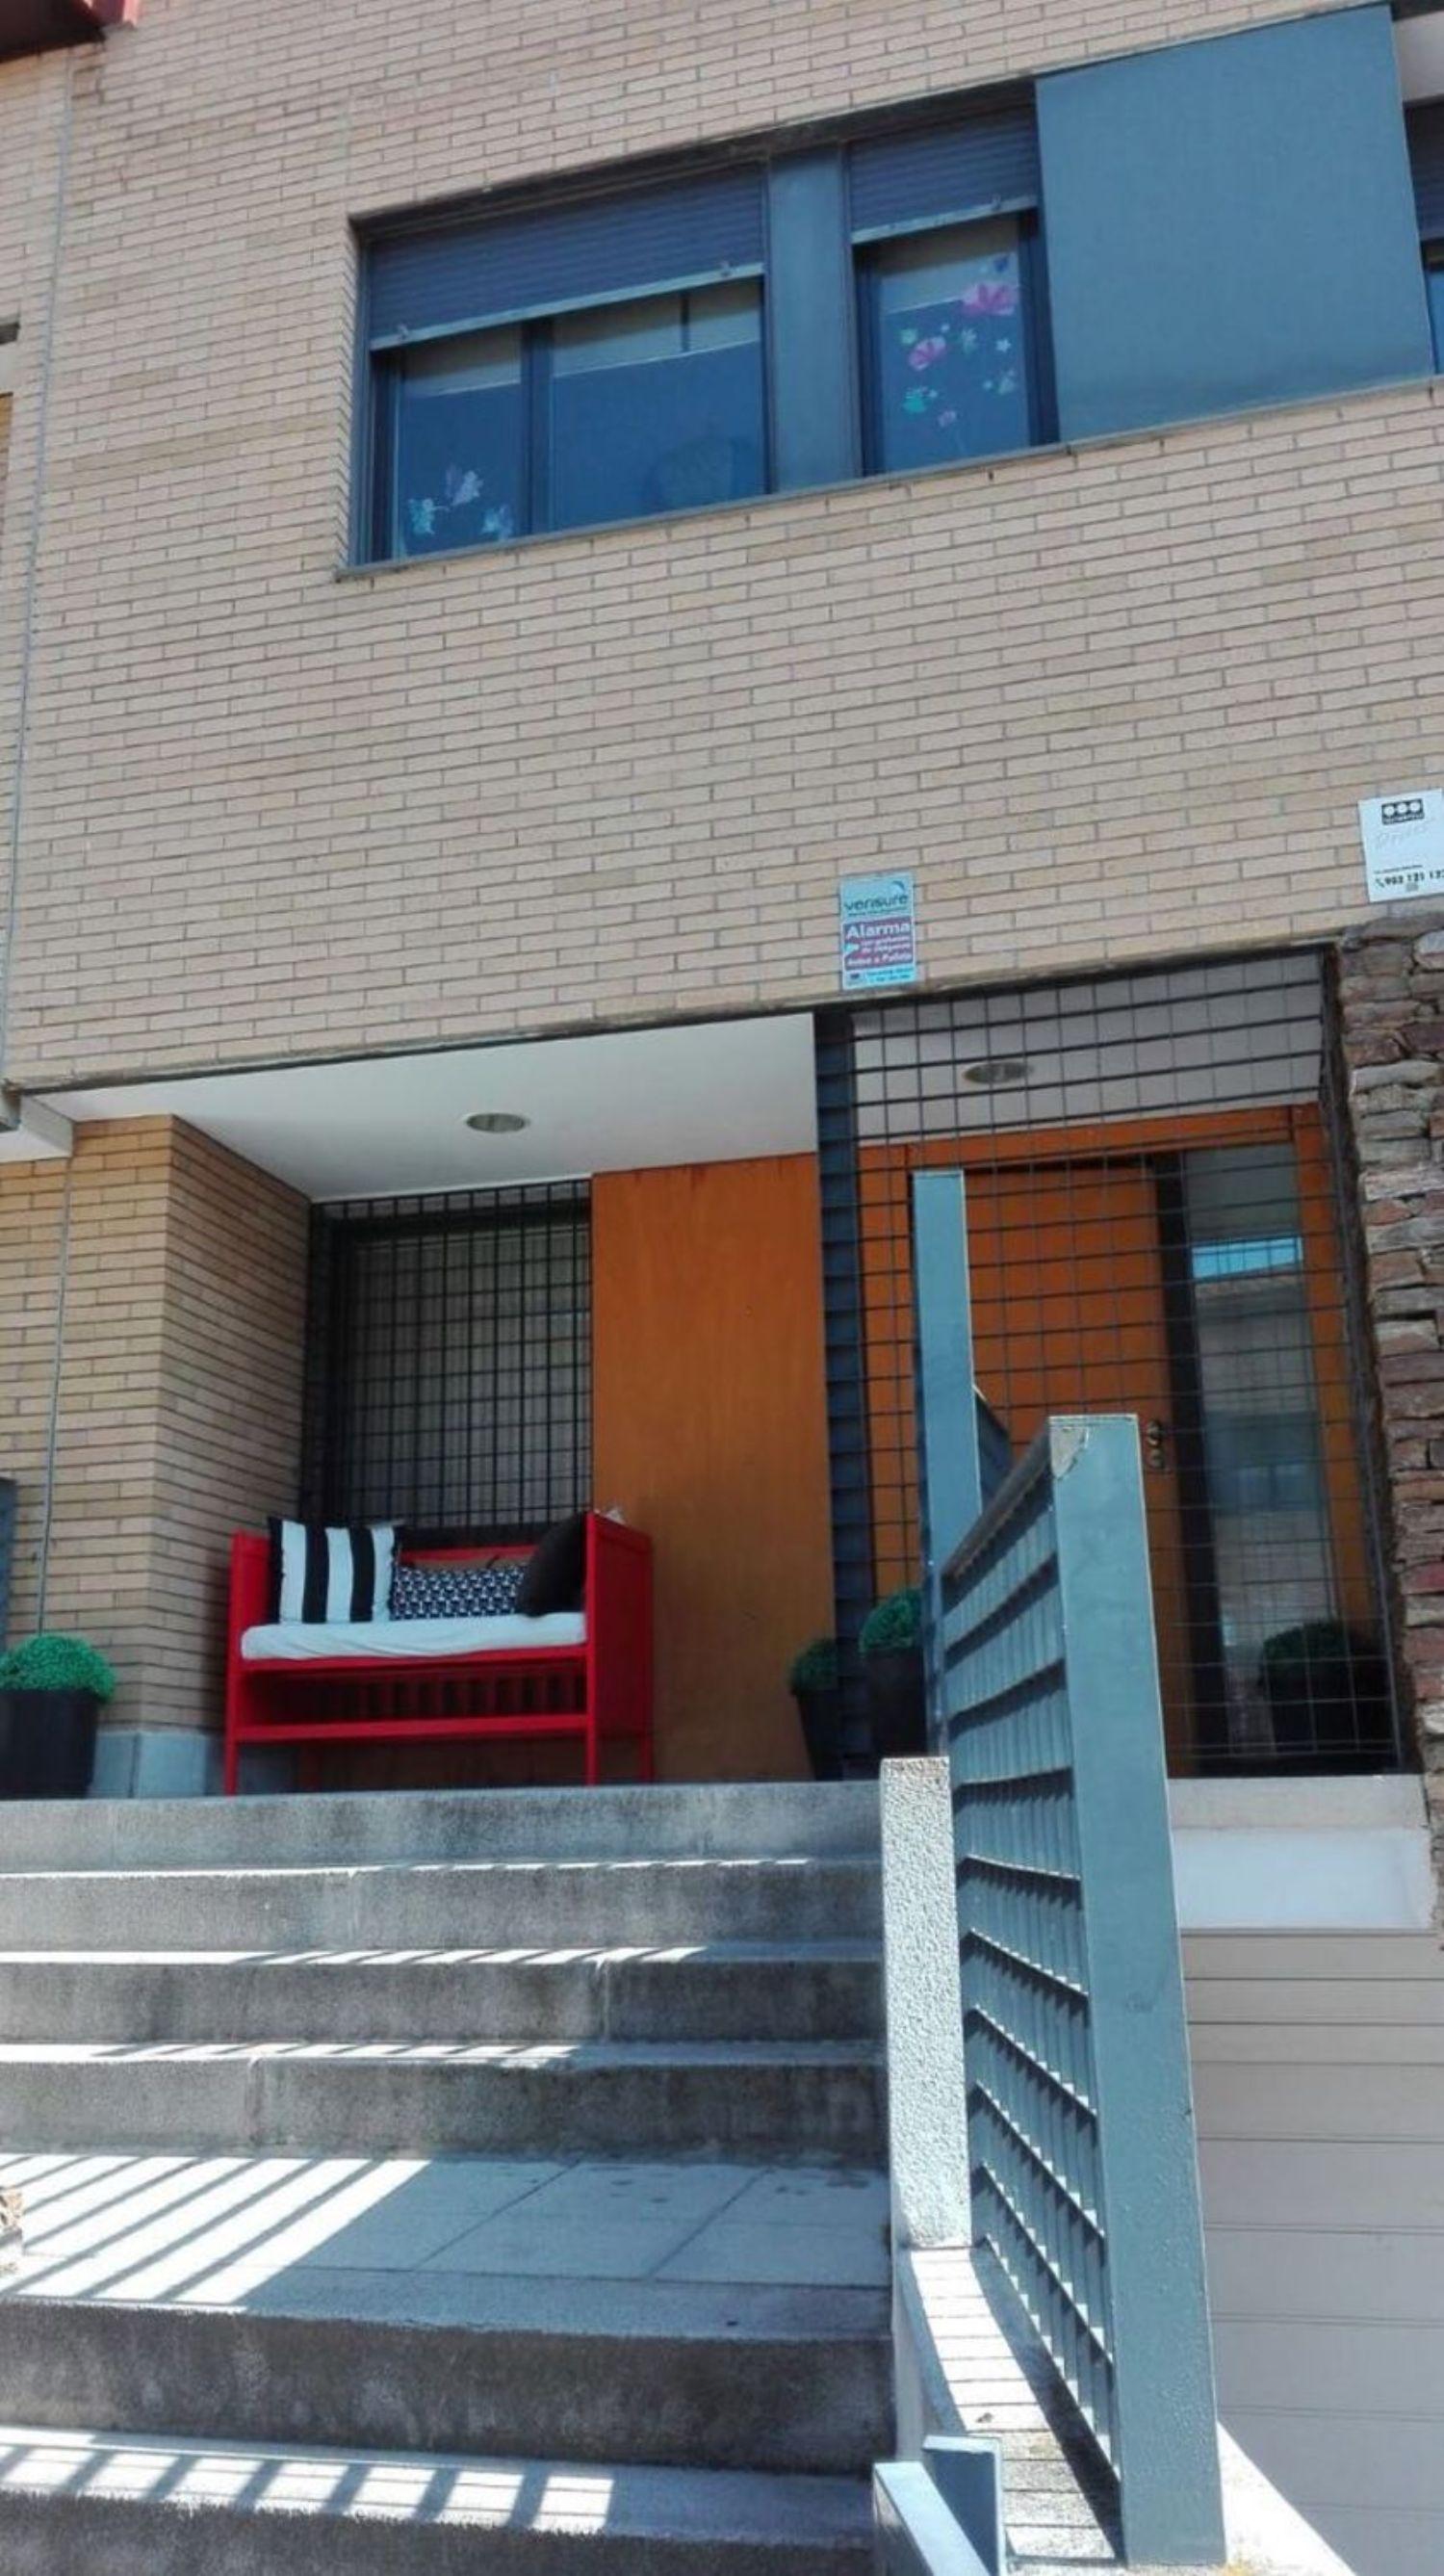 Chalet en venta en Las Rozas de Madrid, Madrid 15 thumbnail